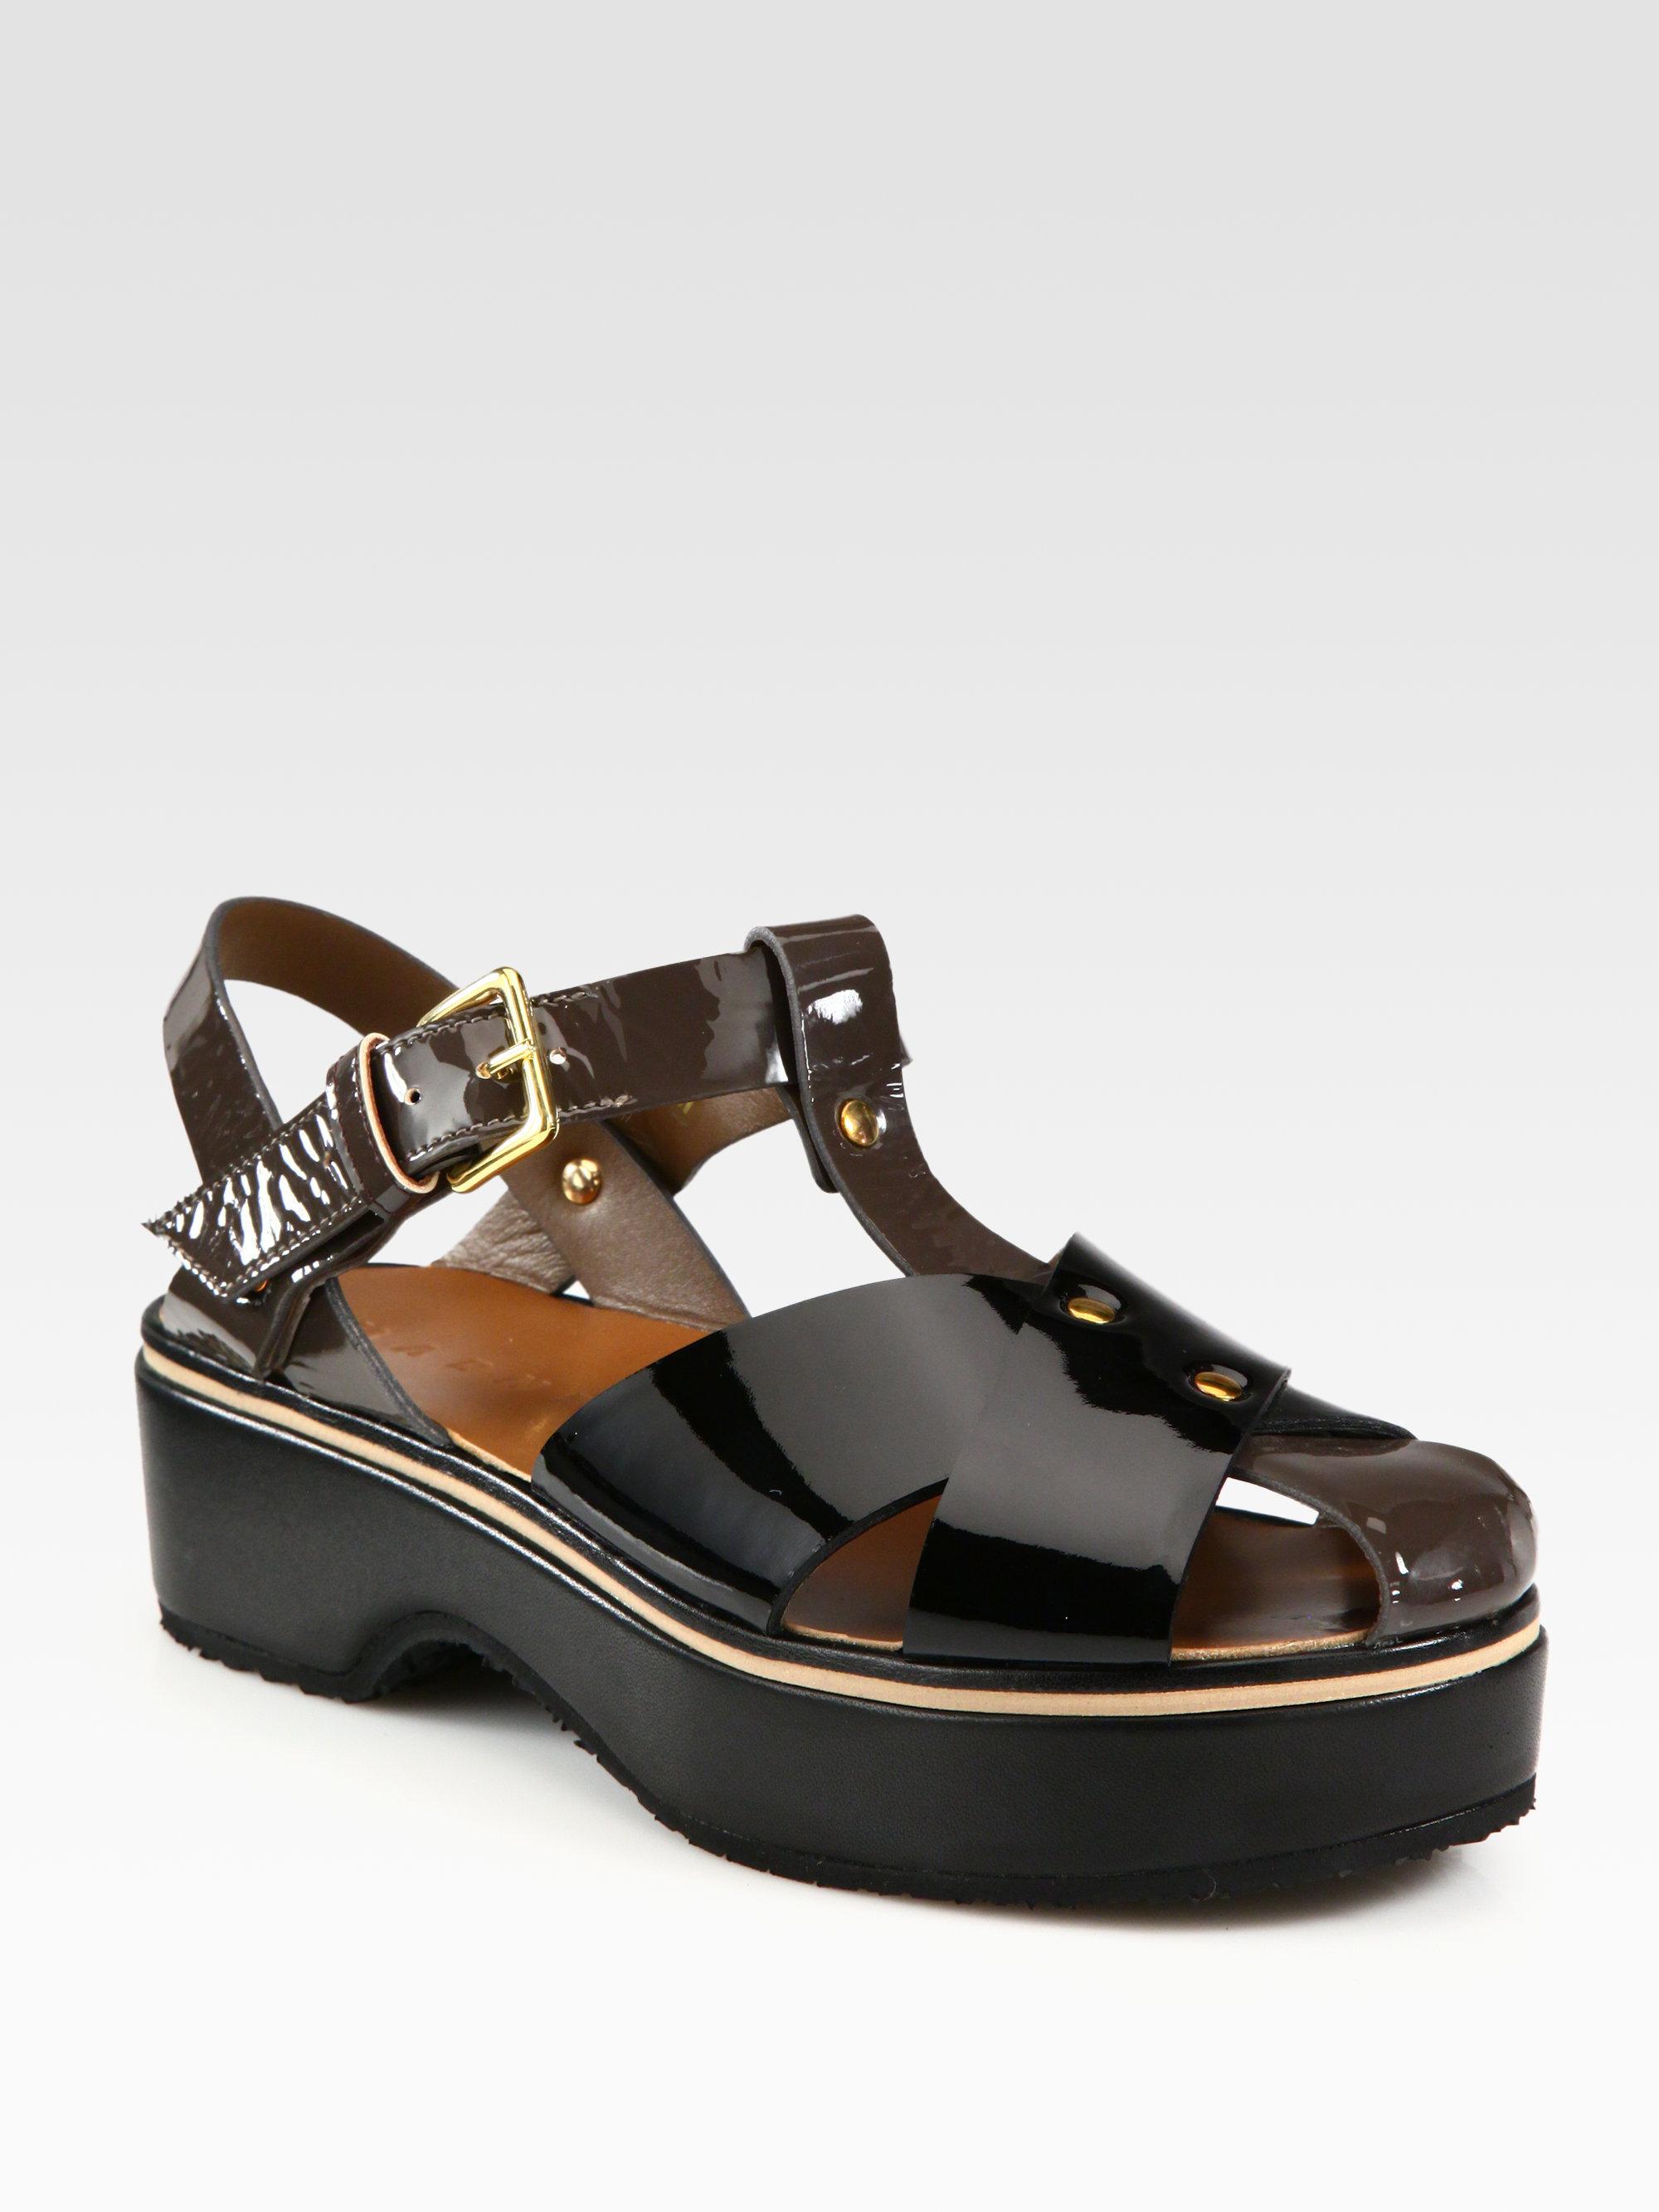 Marni Patent Leather Sandals 67ddWqYx